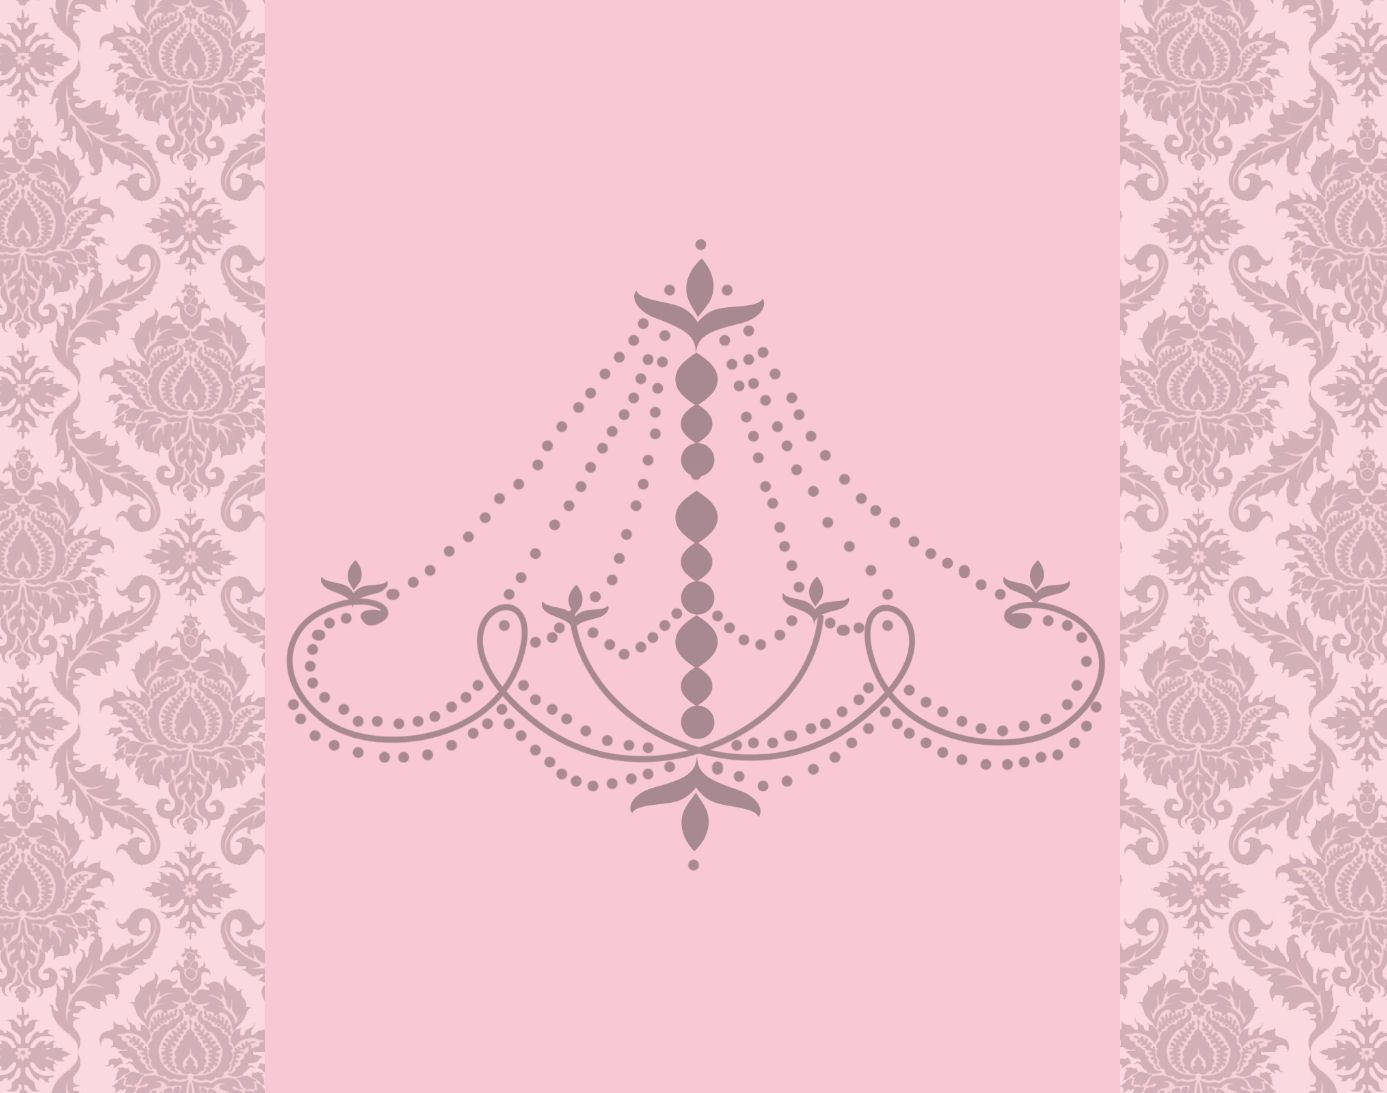 shabby lane shops free blog backgrounds chandelier chic by catherine backgrounds pinterest. Black Bedroom Furniture Sets. Home Design Ideas